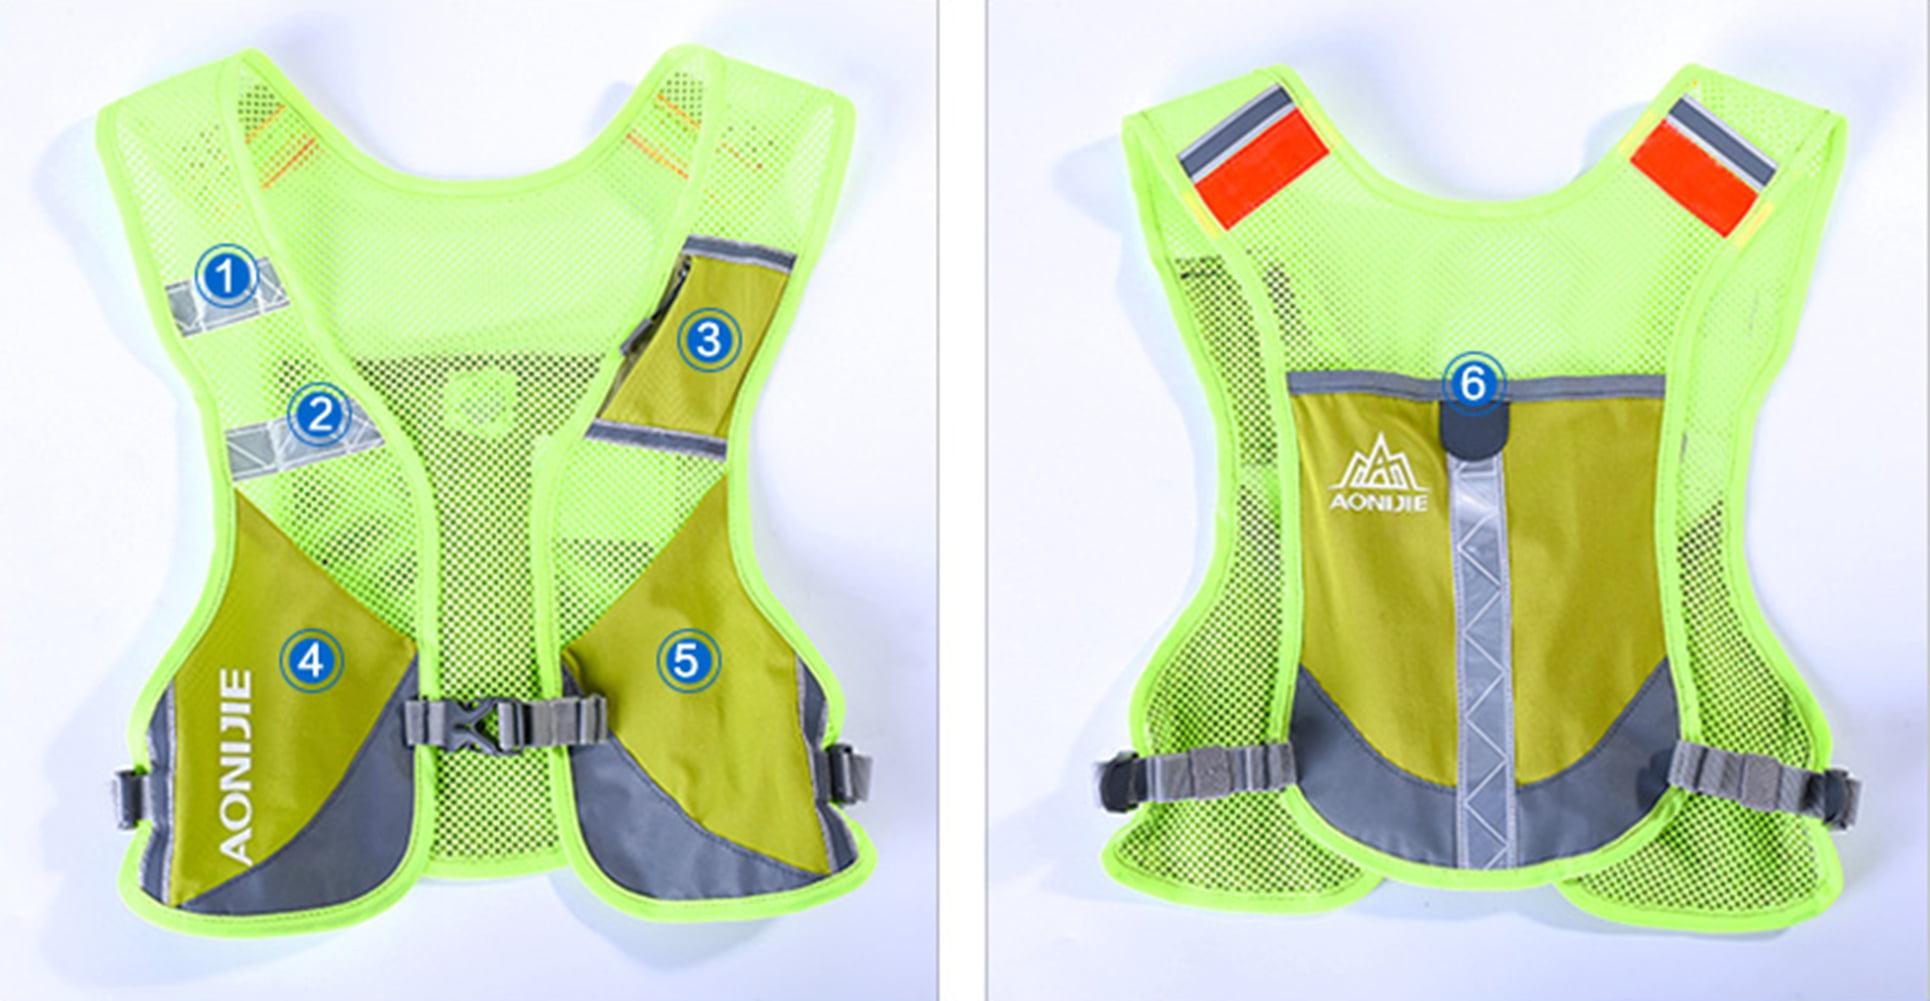 Reflective Marathoner Race Hydration Vest Color:Green by